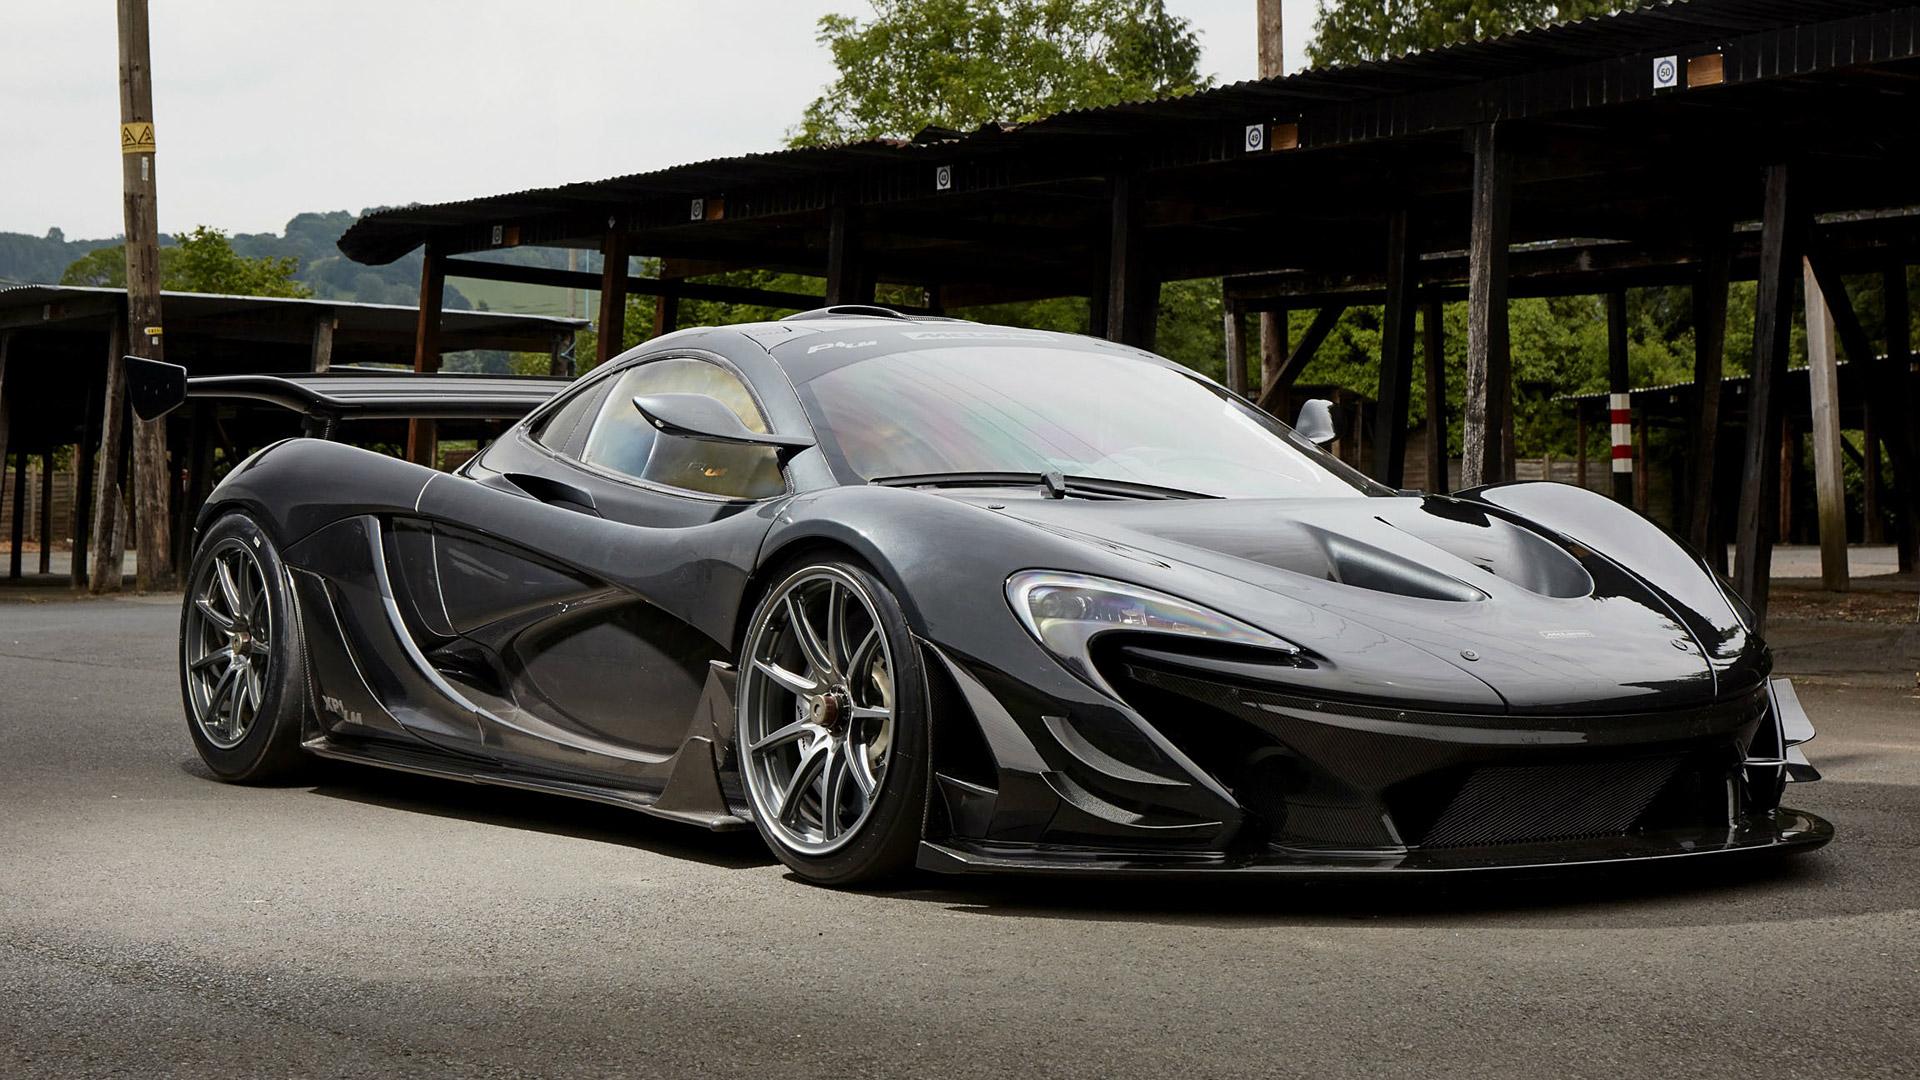 2016 McLaren P1 LM Wallpapers Specs Videos   4K HD   WSupercars 1920x1080